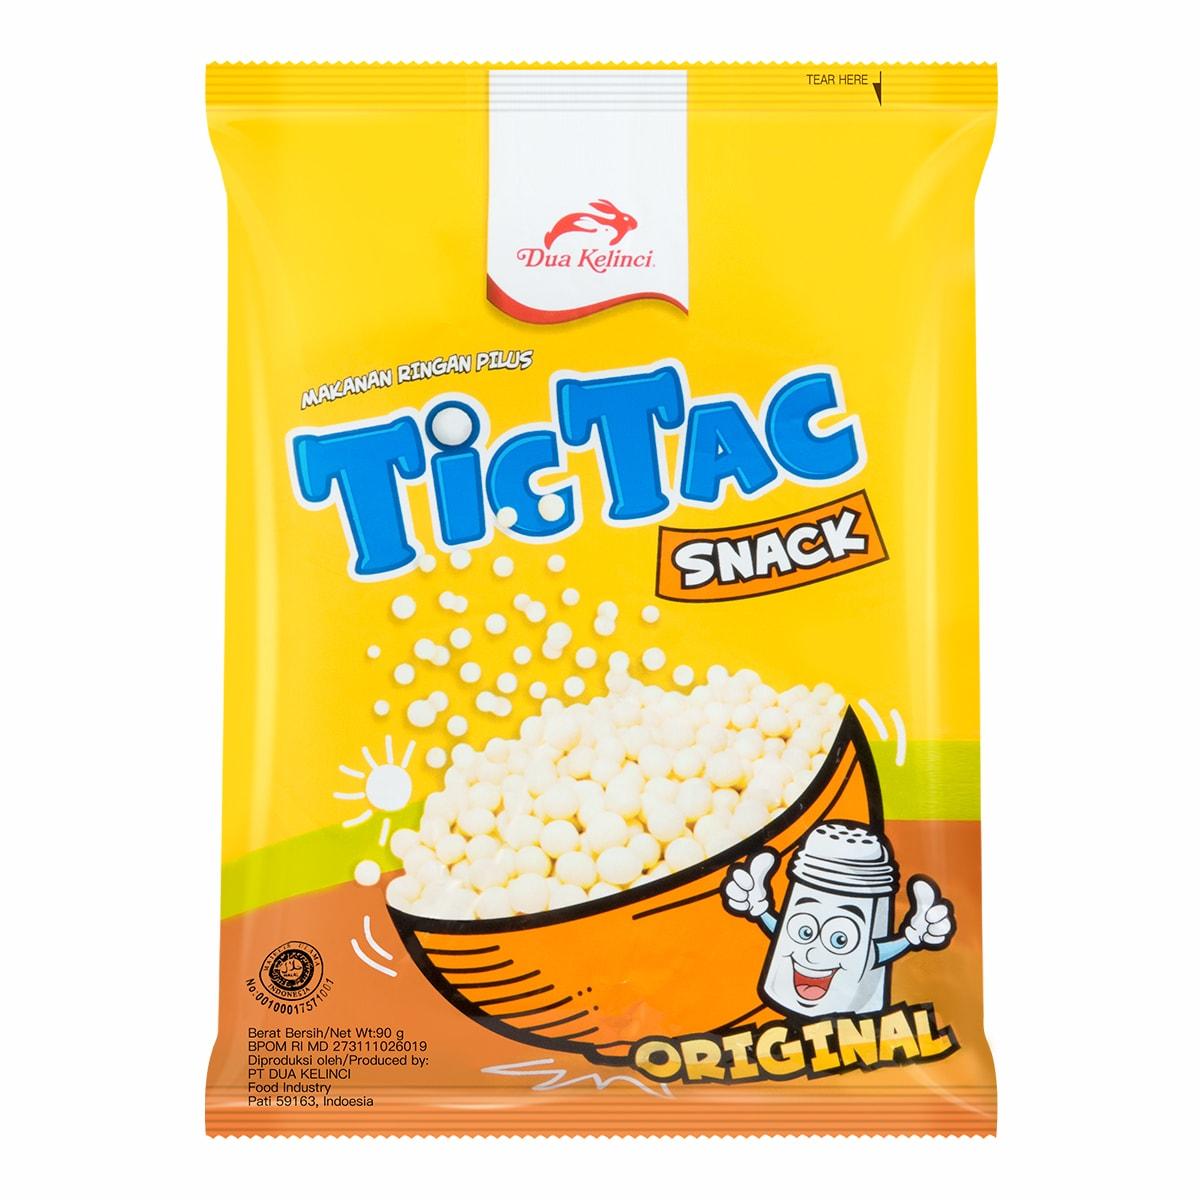 DUA KELINCI TicTac Snacks Original 90g